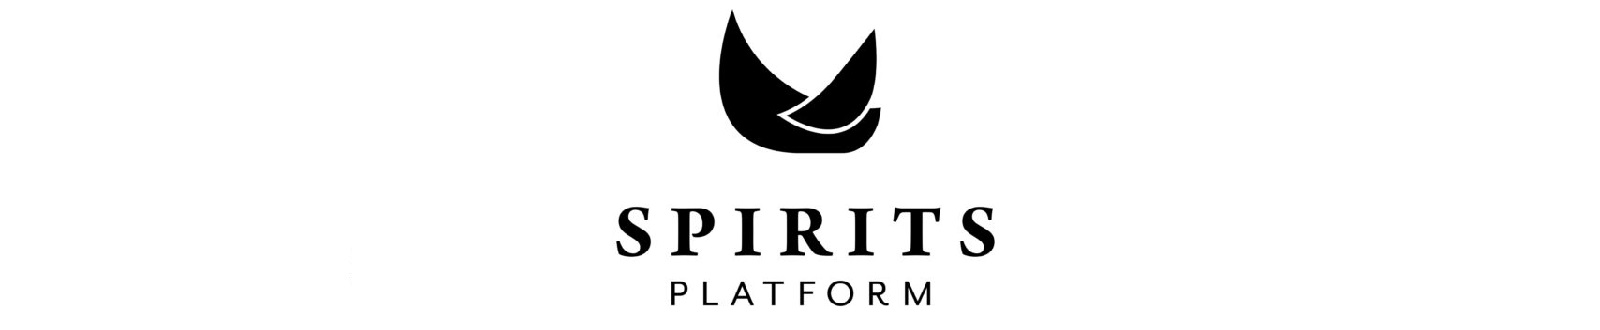 Spirits Platform